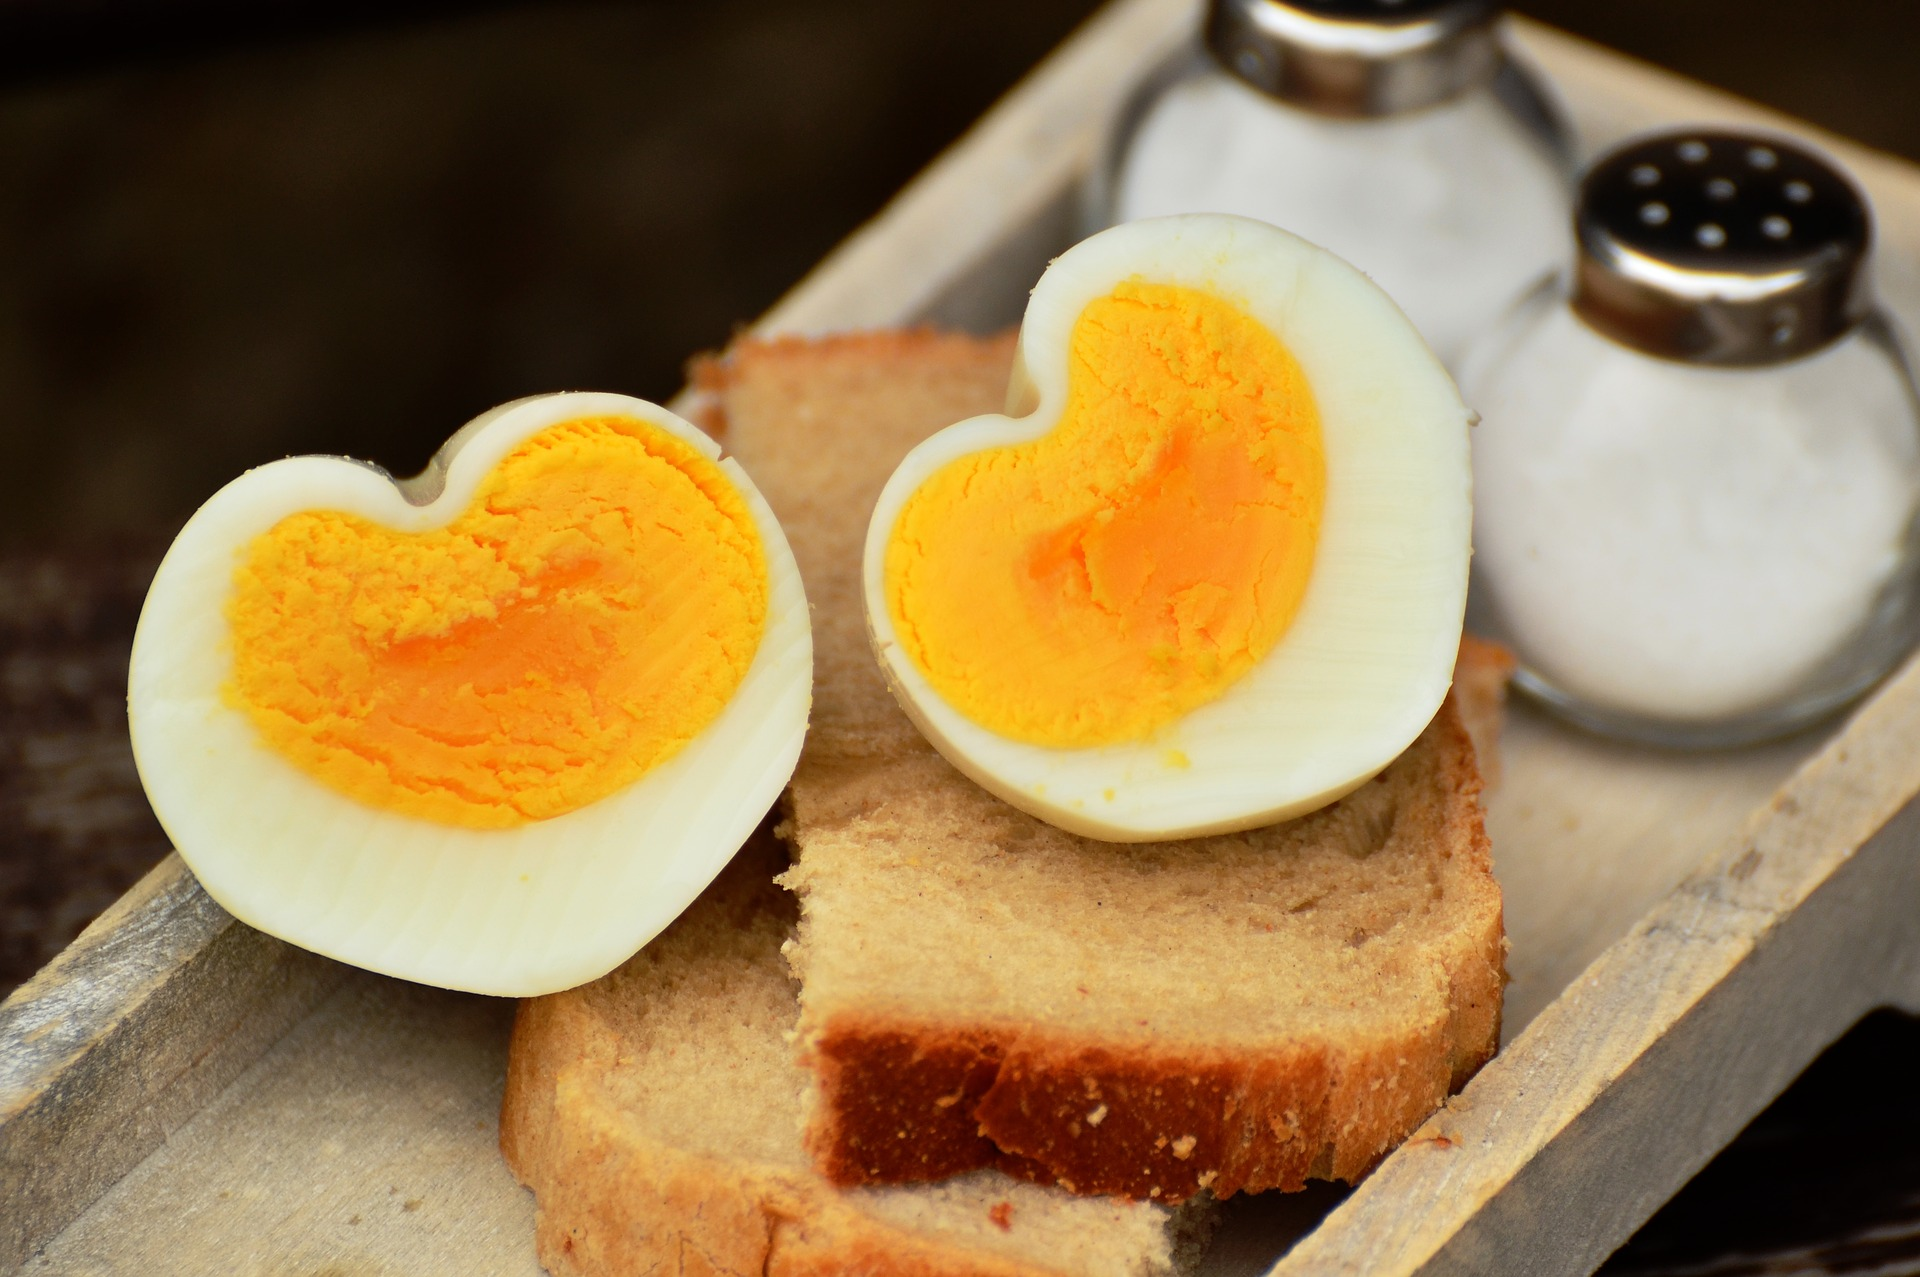 eggs affect on cholesterol